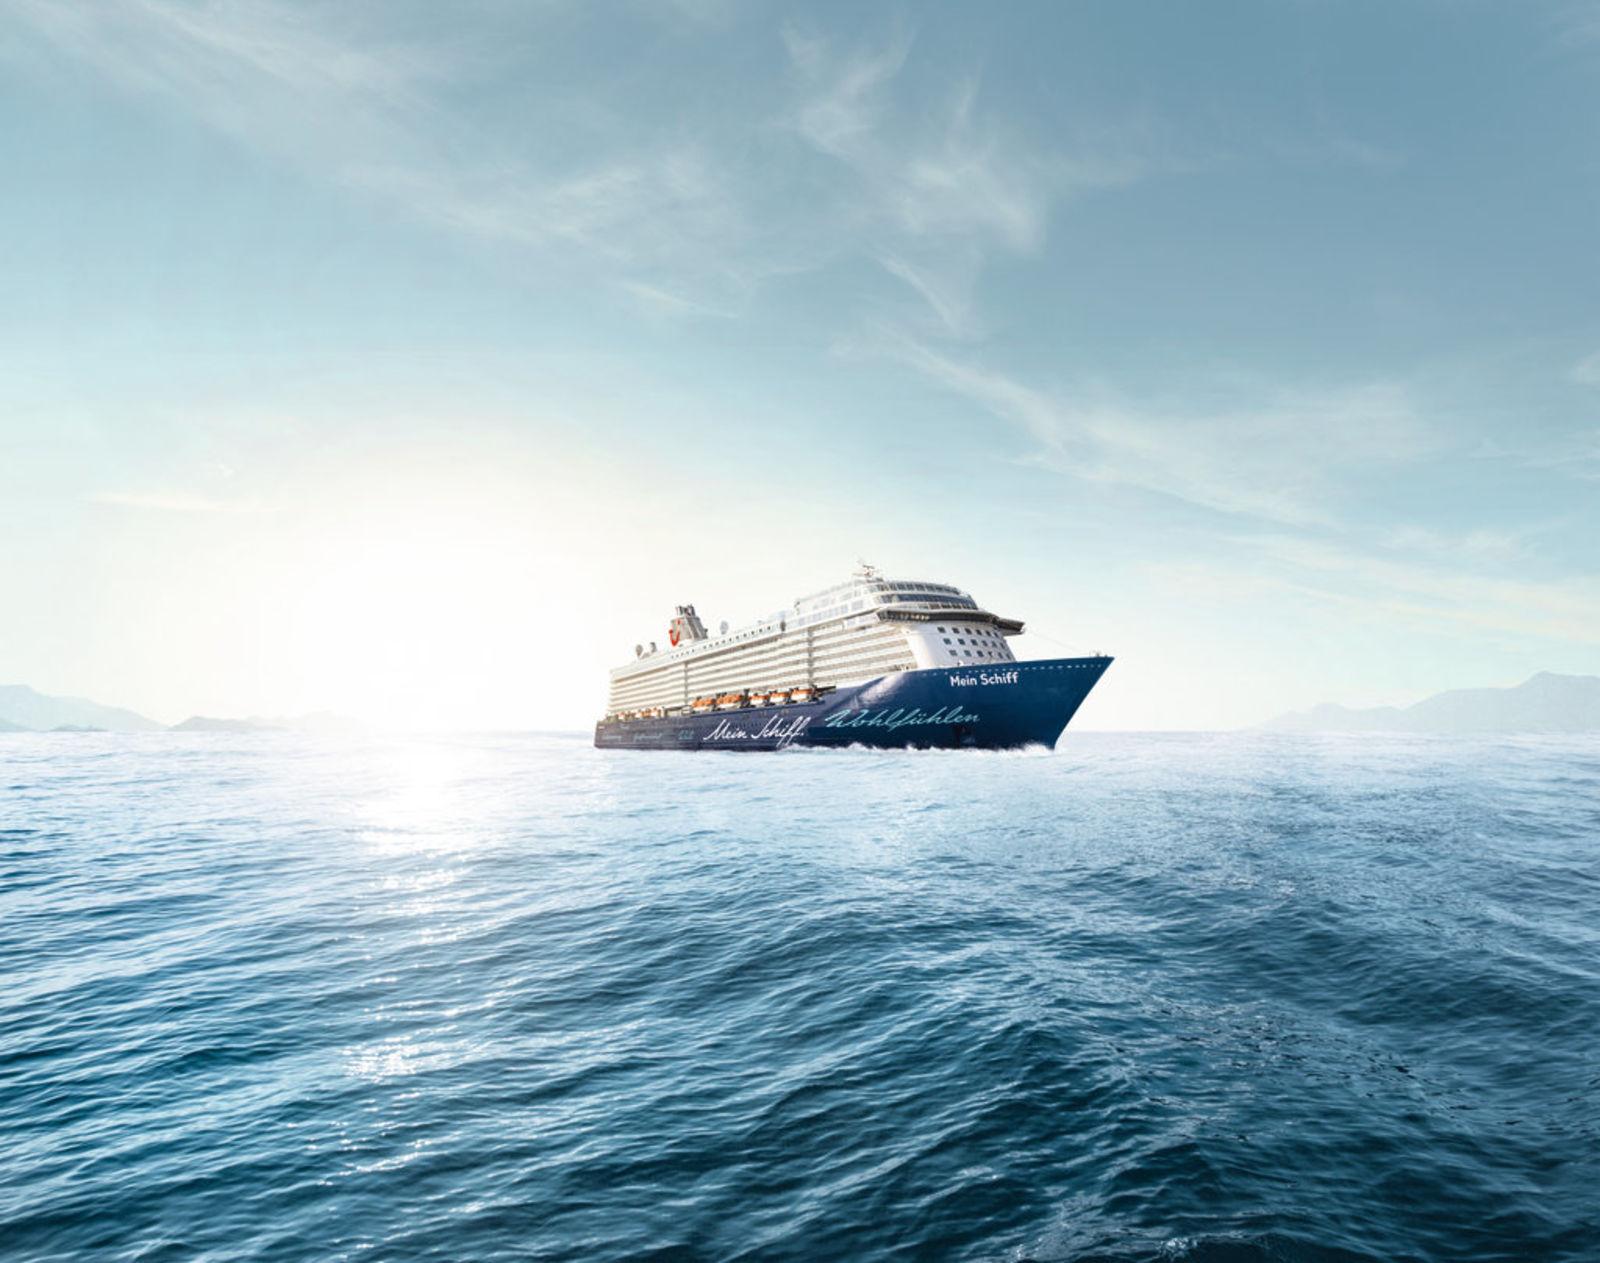 Mein Schiff, TUI Cruises